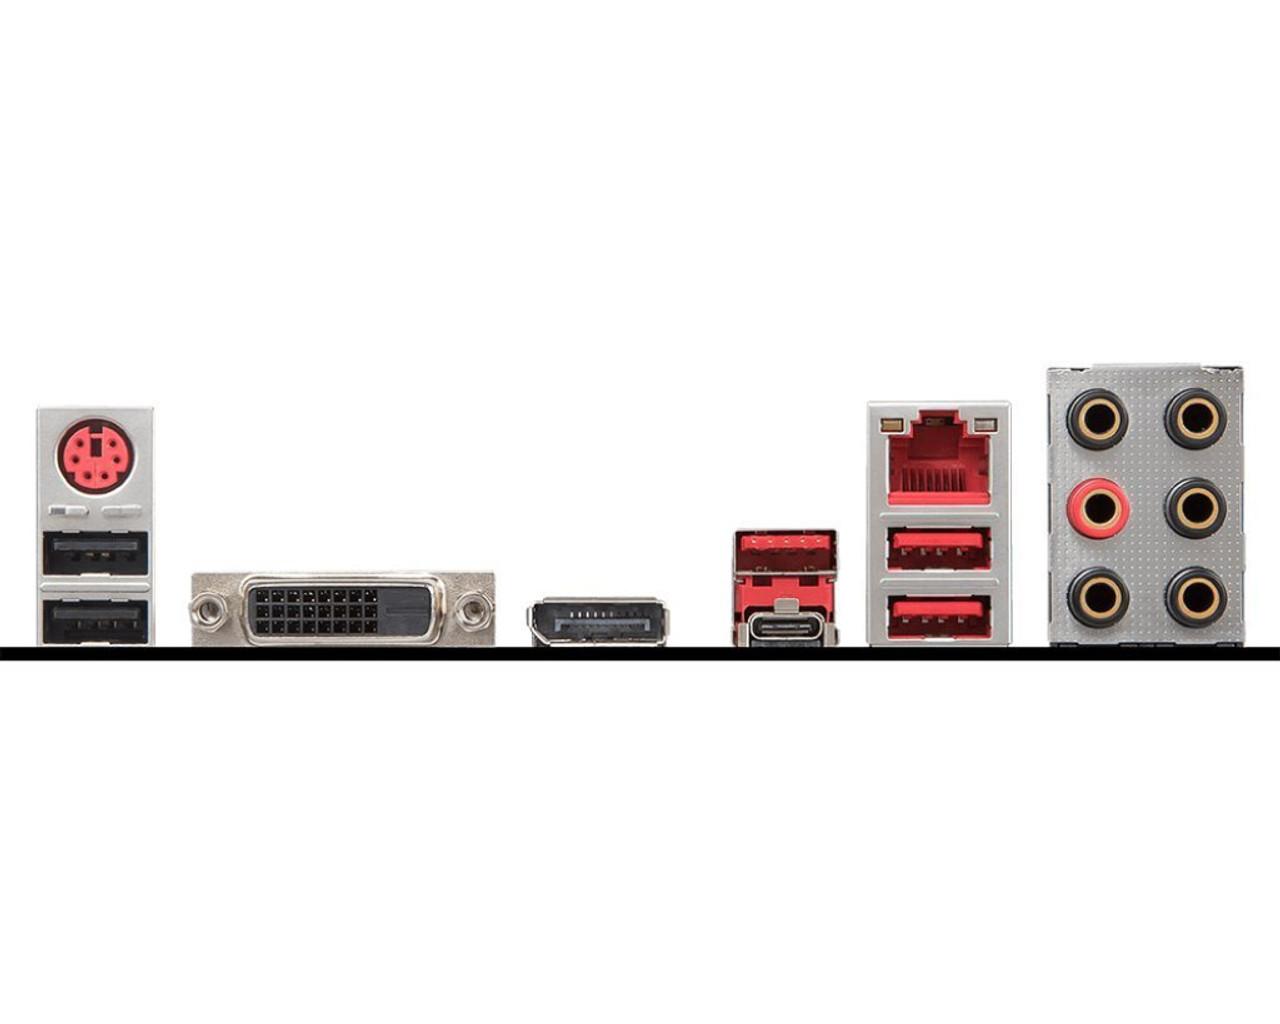 Motherboard MSI Performance Gaming Intel Coffee Lake B360 LGA 1151 DDR4 Onboard Graphics CFX ATX Motherboard (B360 Gaming Plus)